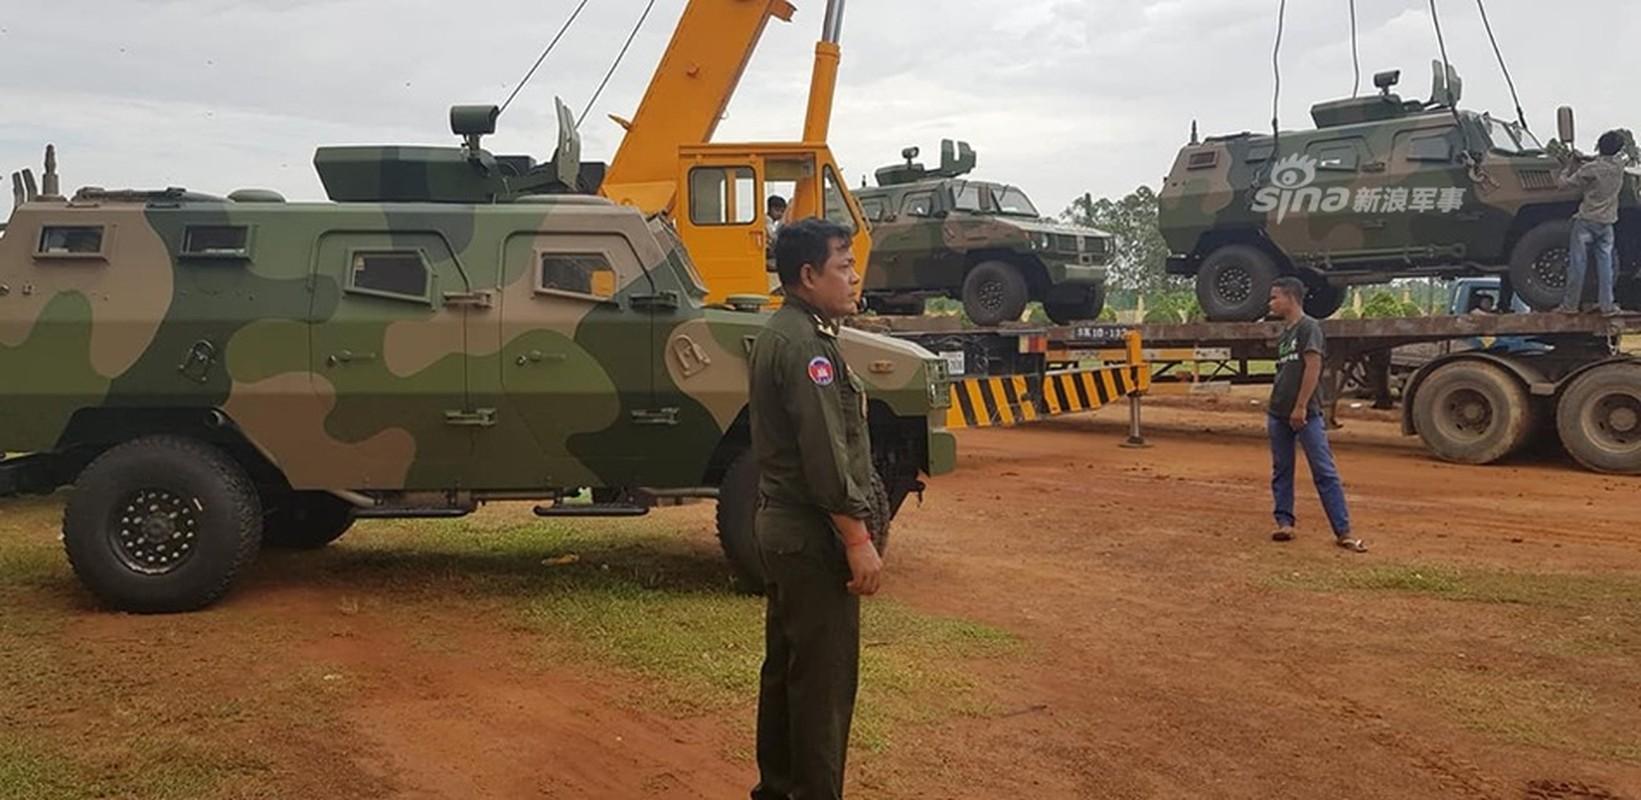 Chang mat dong nao, Campuchia van co loat thiet giap Trung Quoc moi tinh